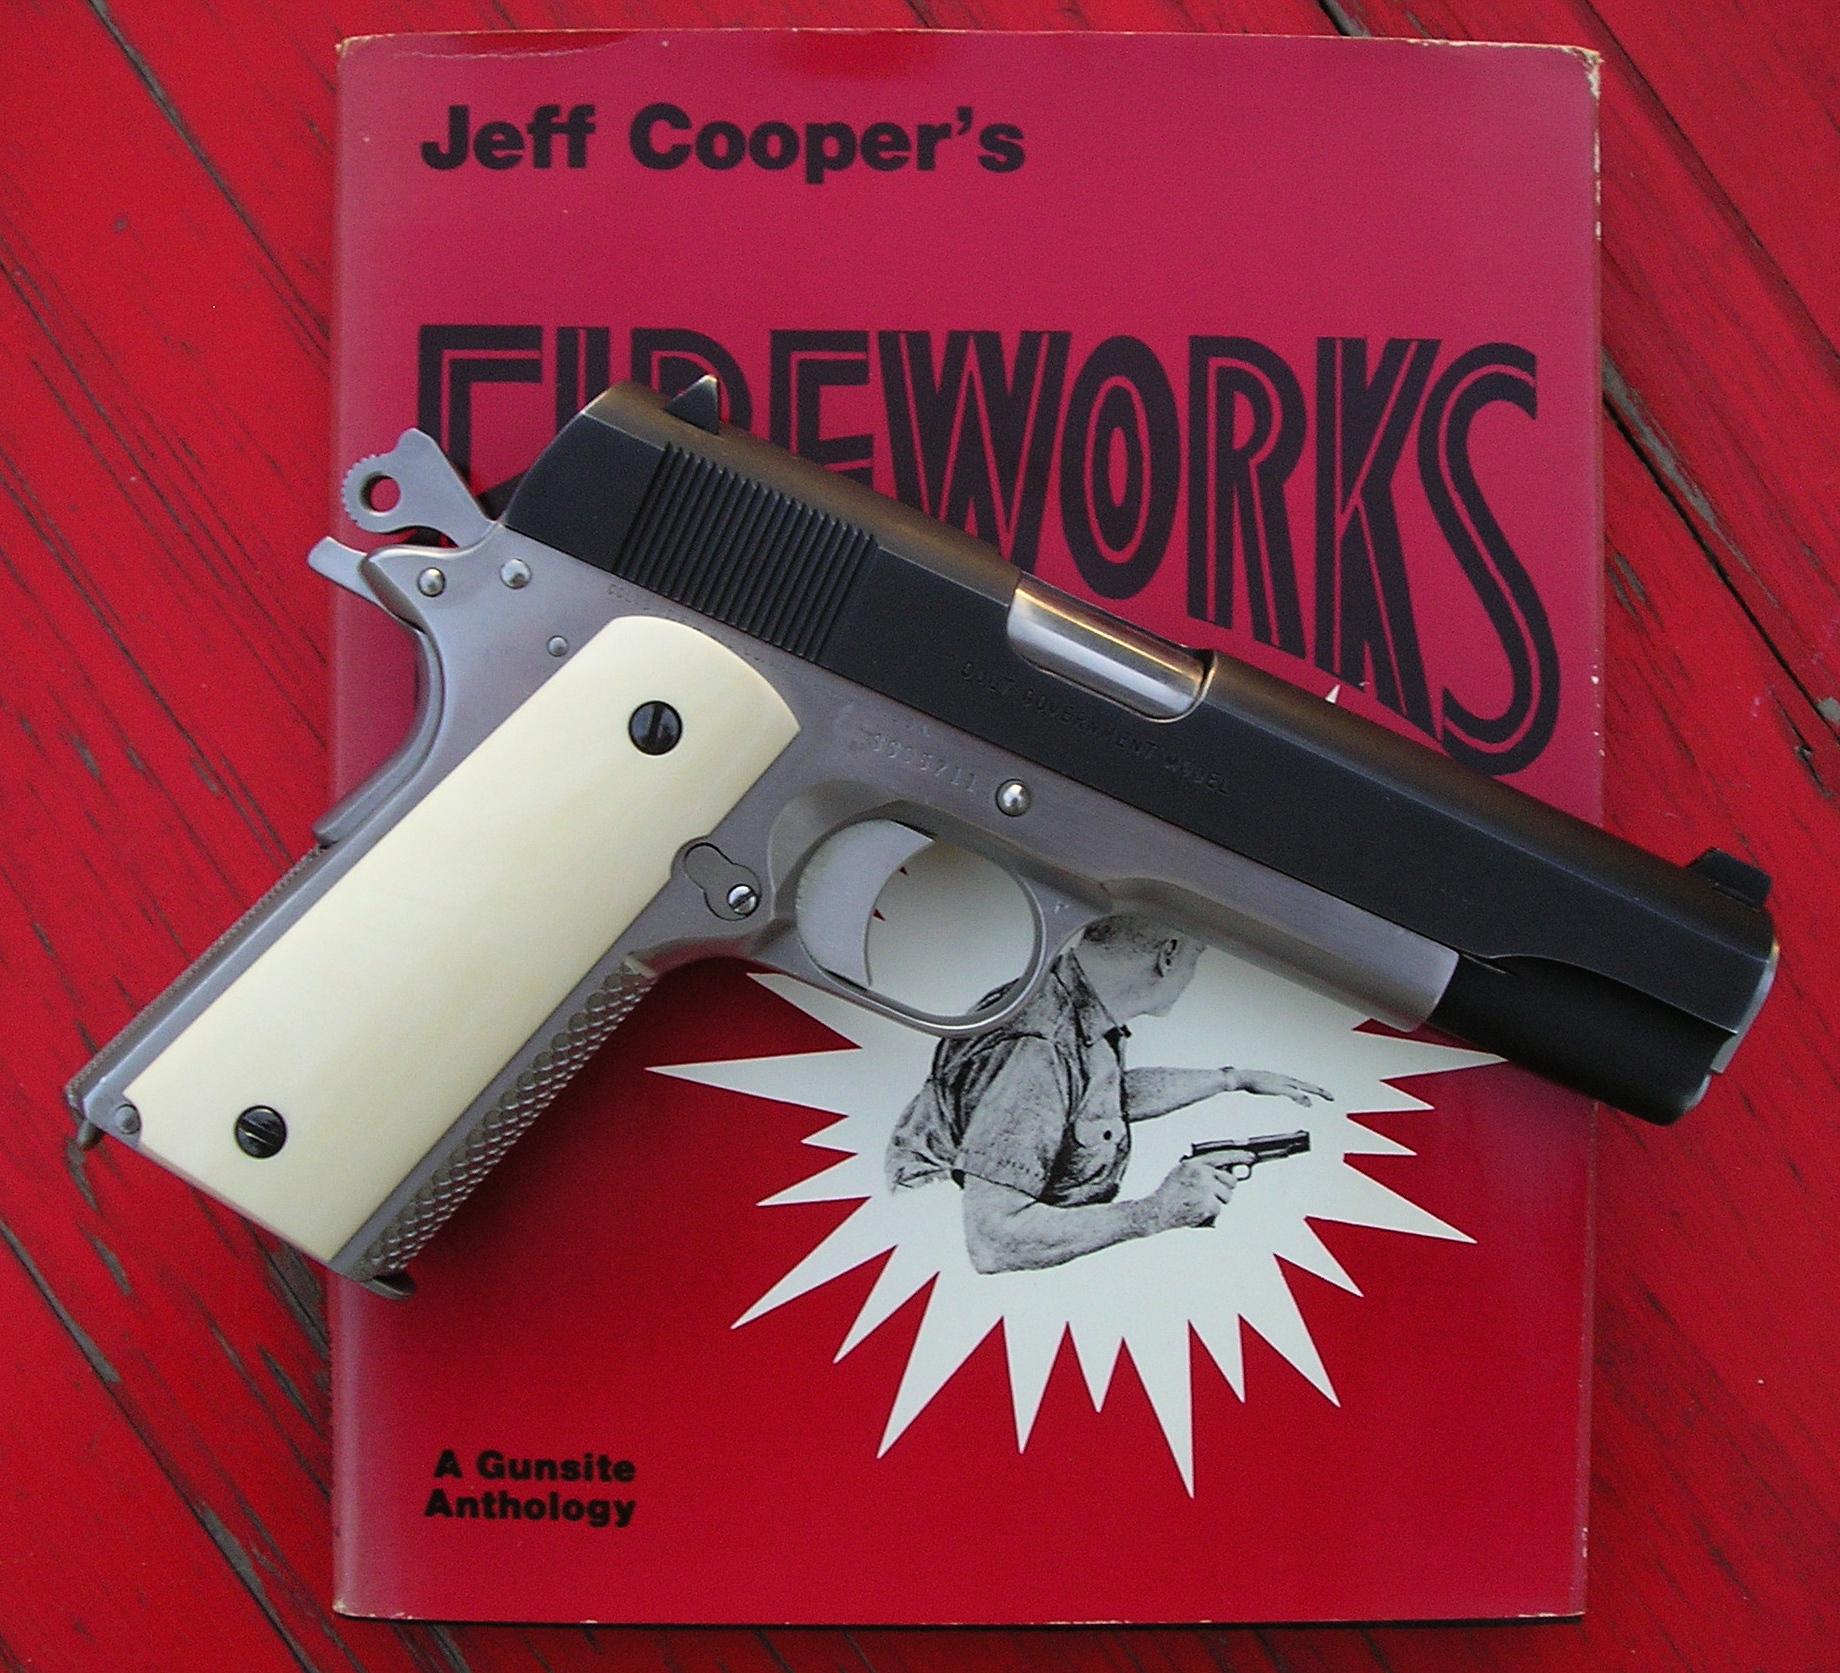 Recommend 1911 Upgrades-cooper-retro.jpg